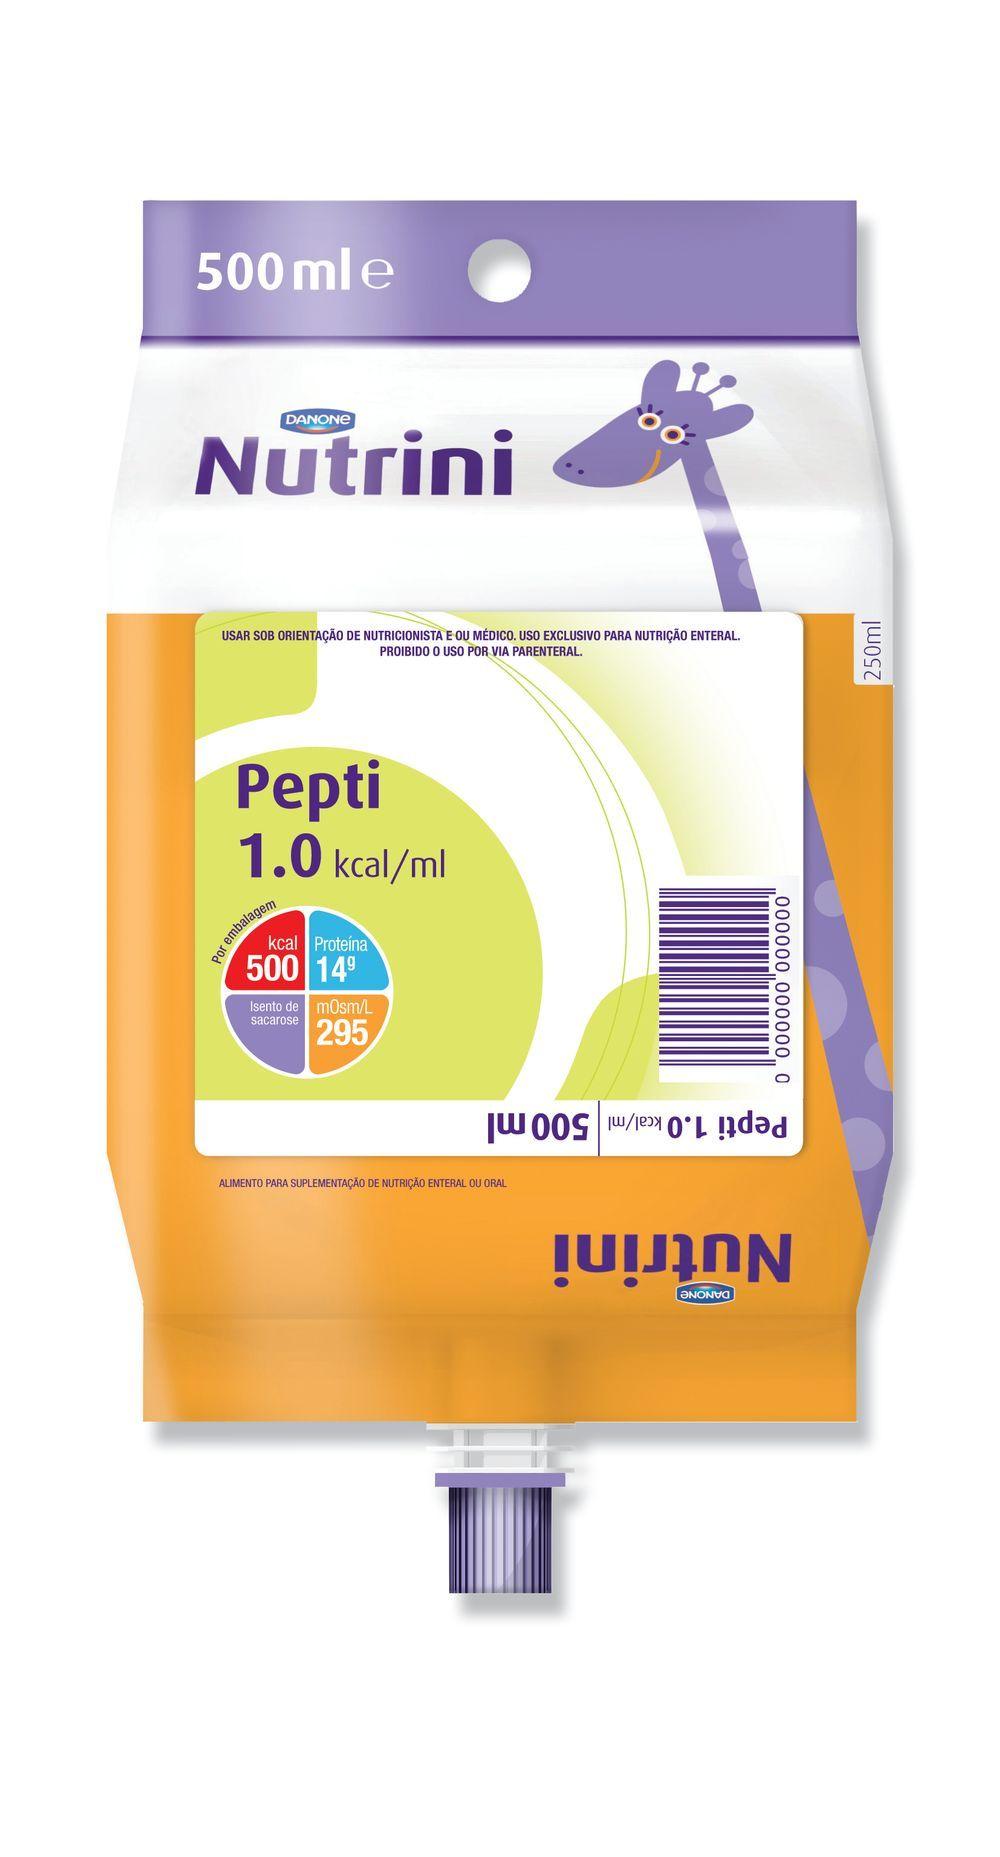 Nutrini Pepti - 500 mL - (DANONE)